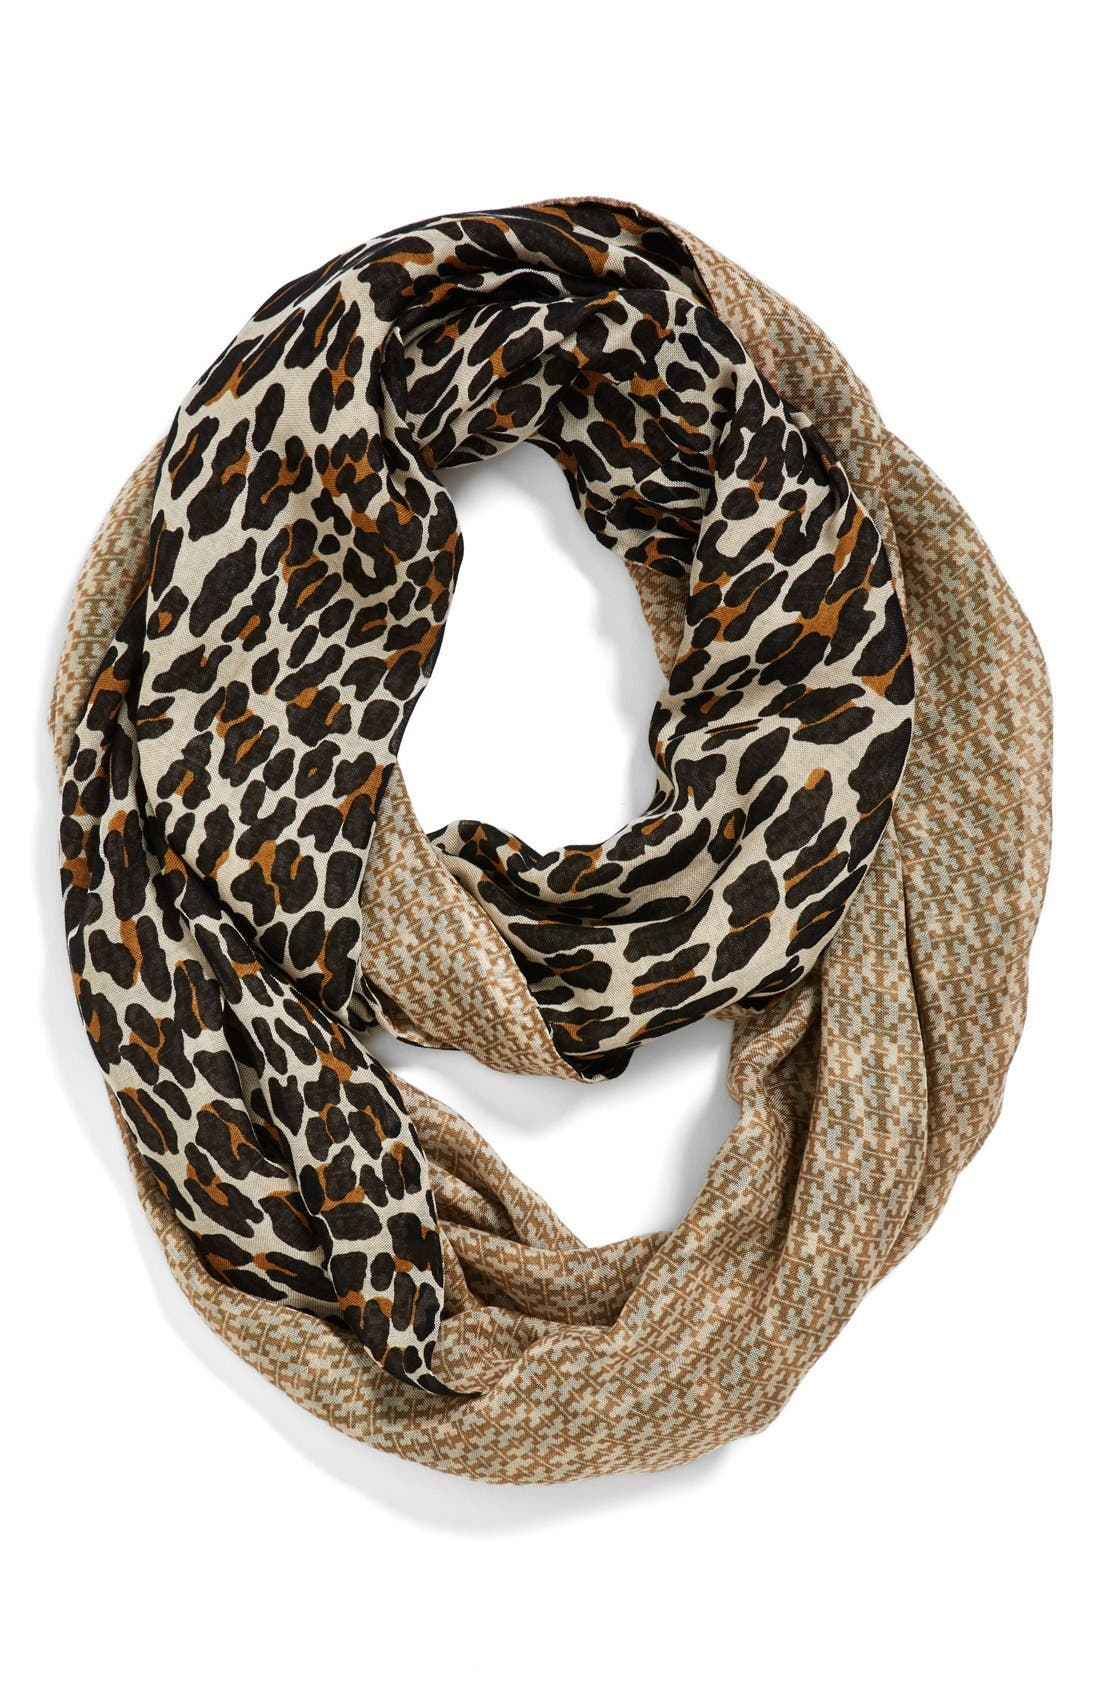 Main Image - Tory Burch 'Reva Leopard' Infinity Scarf